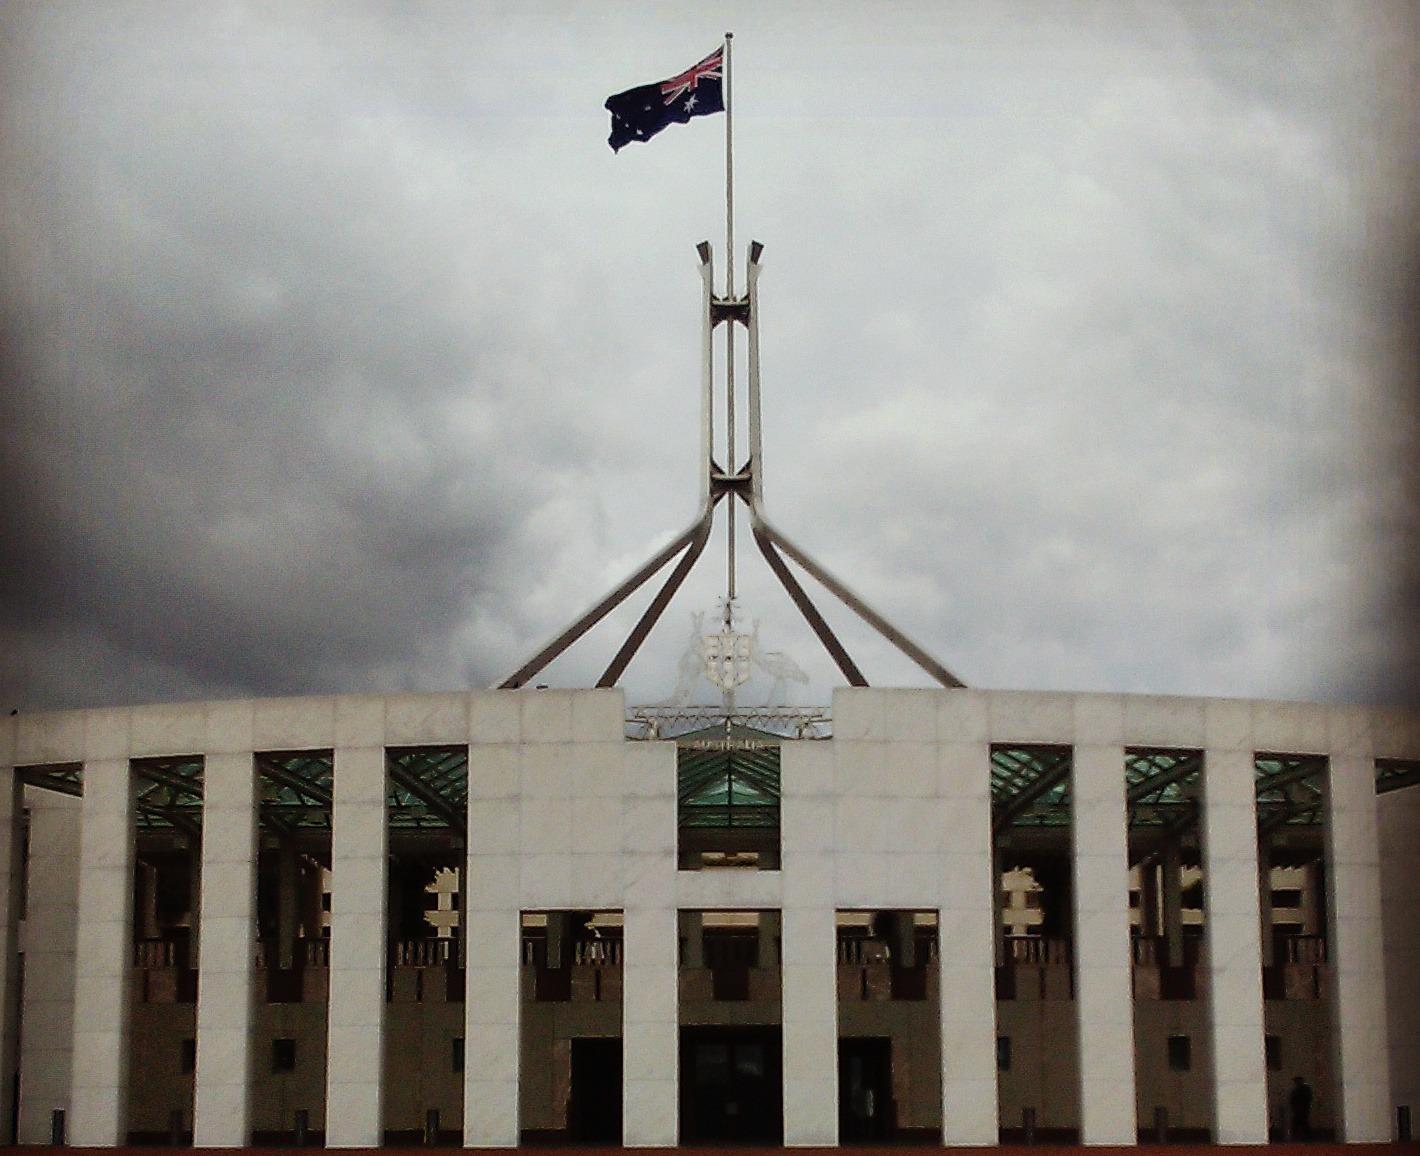 Appetite for transparency in Australia